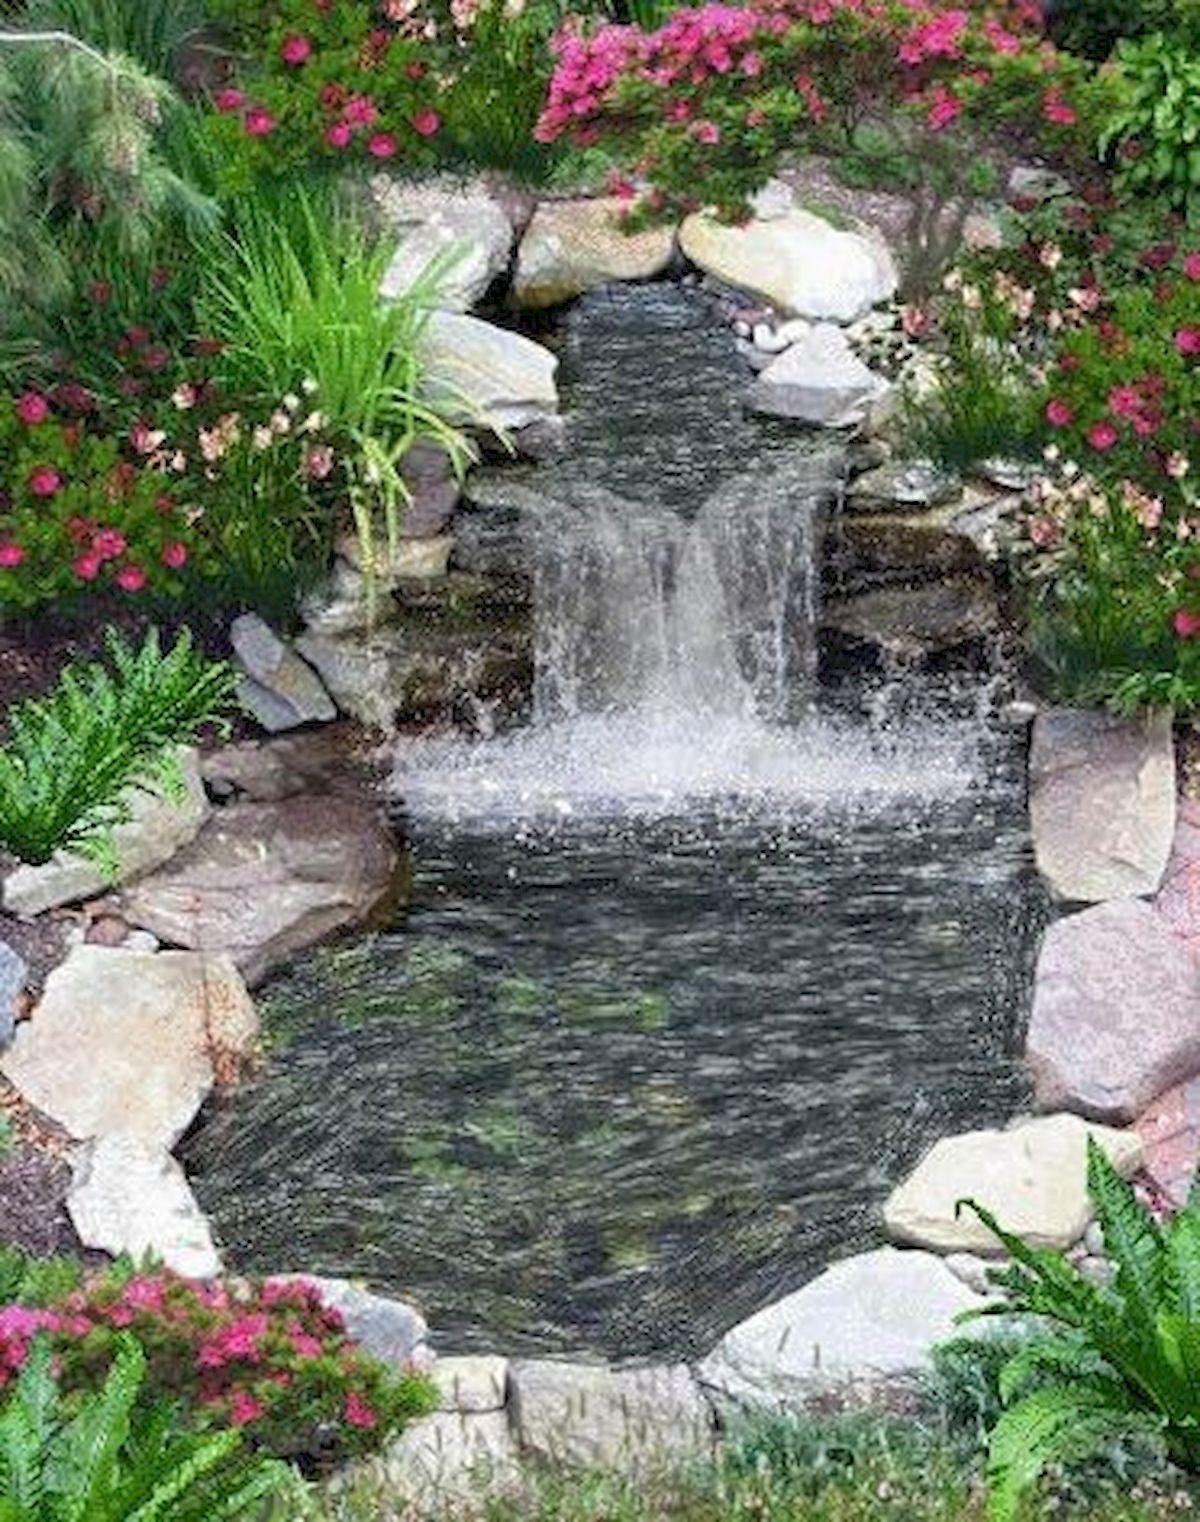 63 Beautiful Backyard Garden Remodel Ideas And Design - Ideaboz #backyardremodel